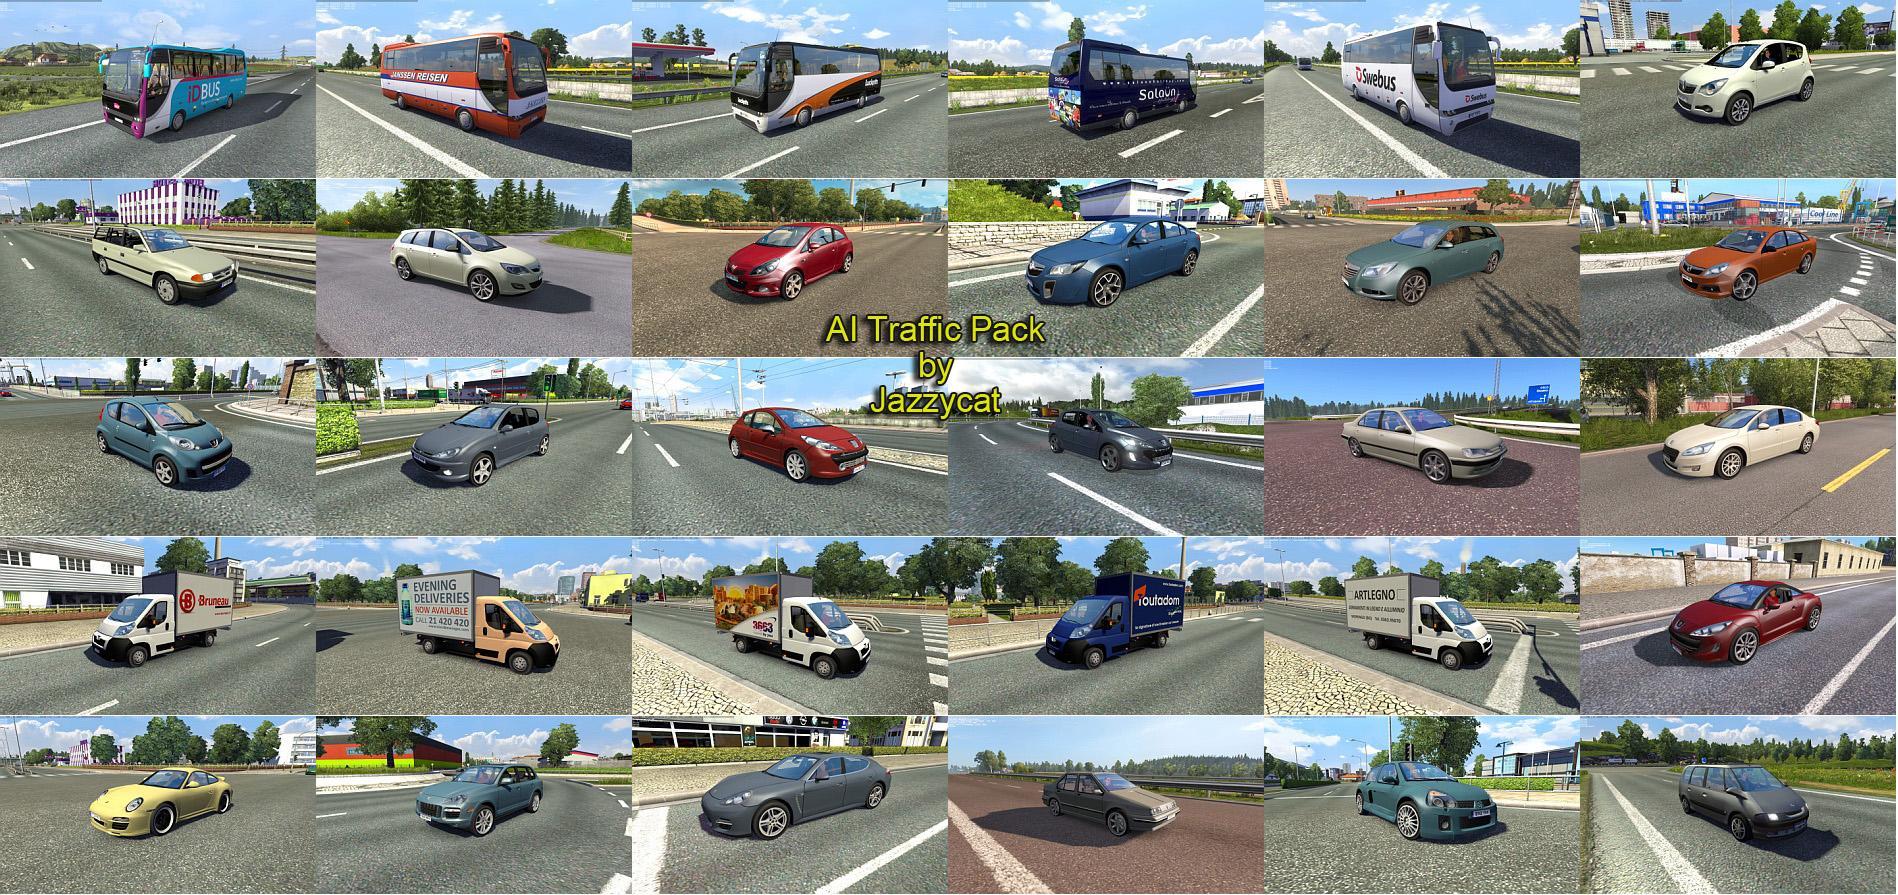 AI Traffic Pack by Jazzycat v2 9 - Modhub us